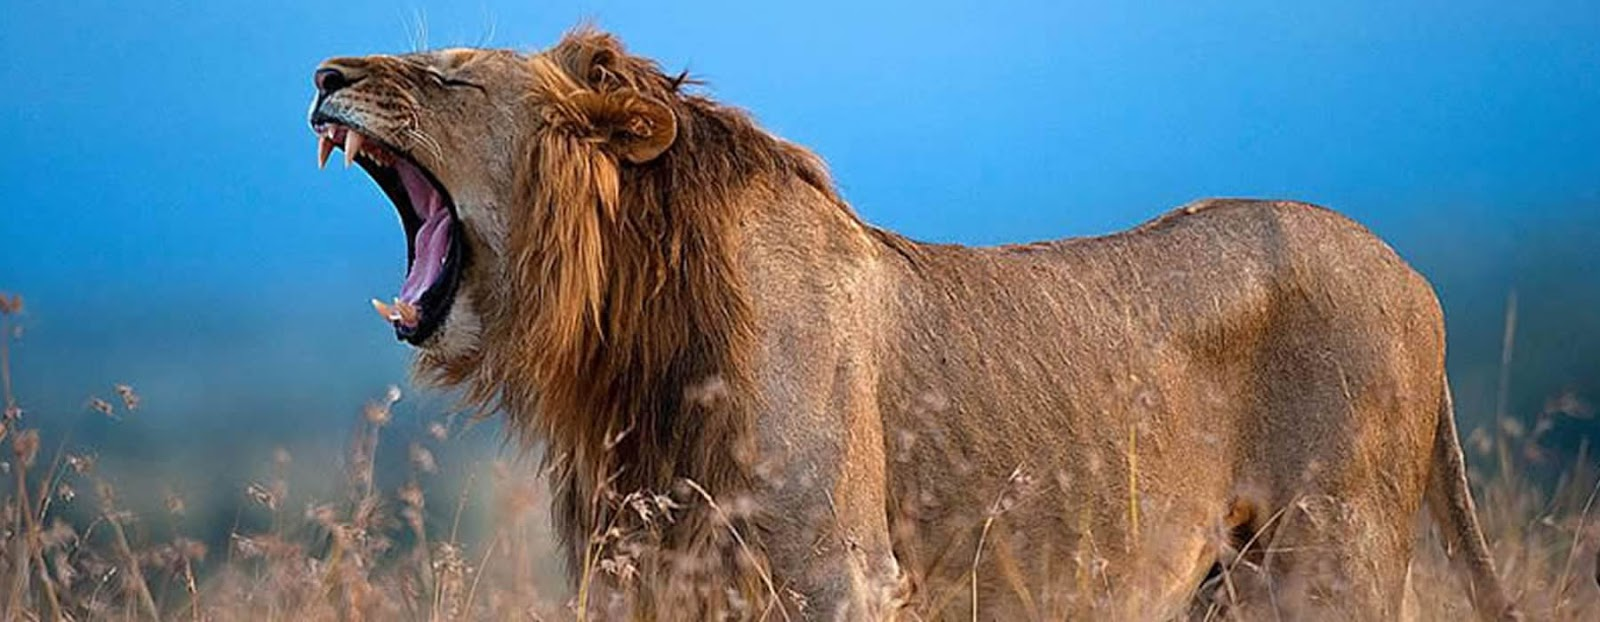 Affordable 12 days Kenya Safari Tour - Amboseli, Lake Nakuru , Masai